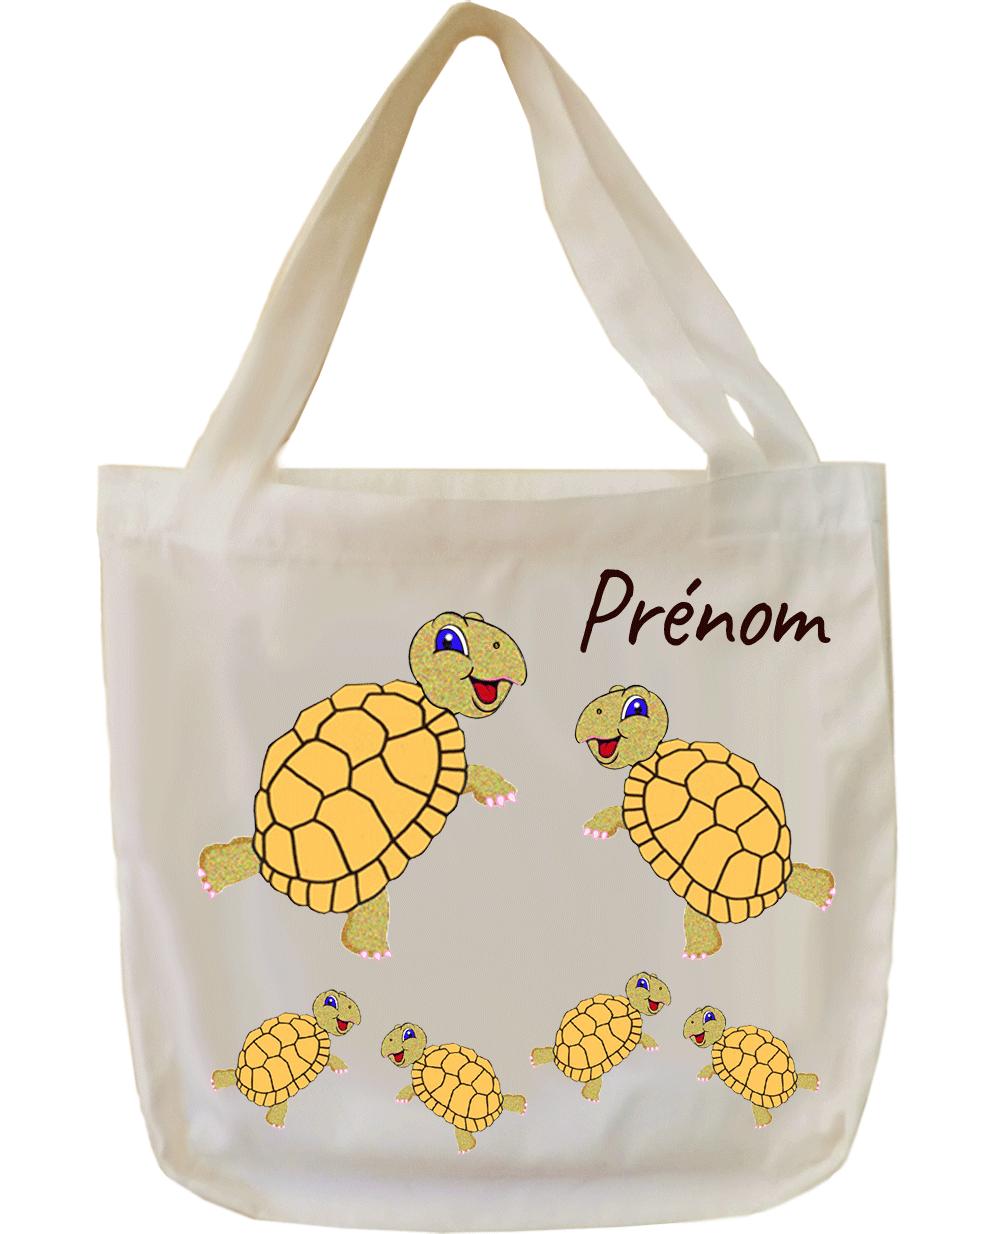 tote-bag;sac;cabas;texti;cadeaux;personnalisable;personnalisation;personnalise;prenom;animal;tortue